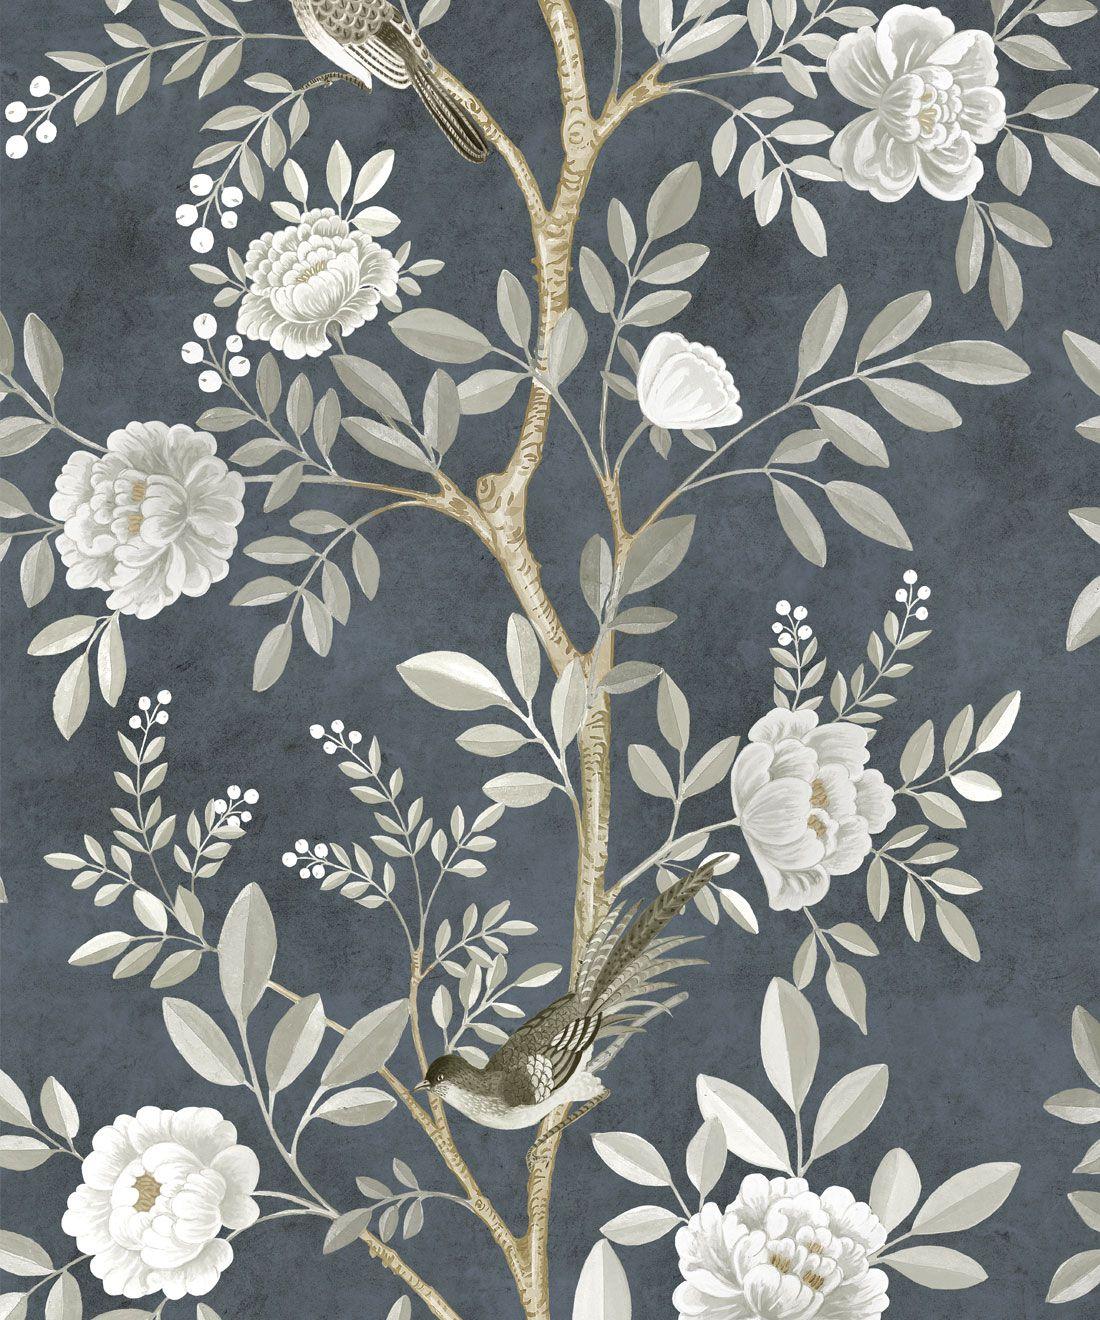 Chinoiserie Wallpaper •Floral Wallpaper •Bird Wallpaper • Magnolia • Navy • Swatch